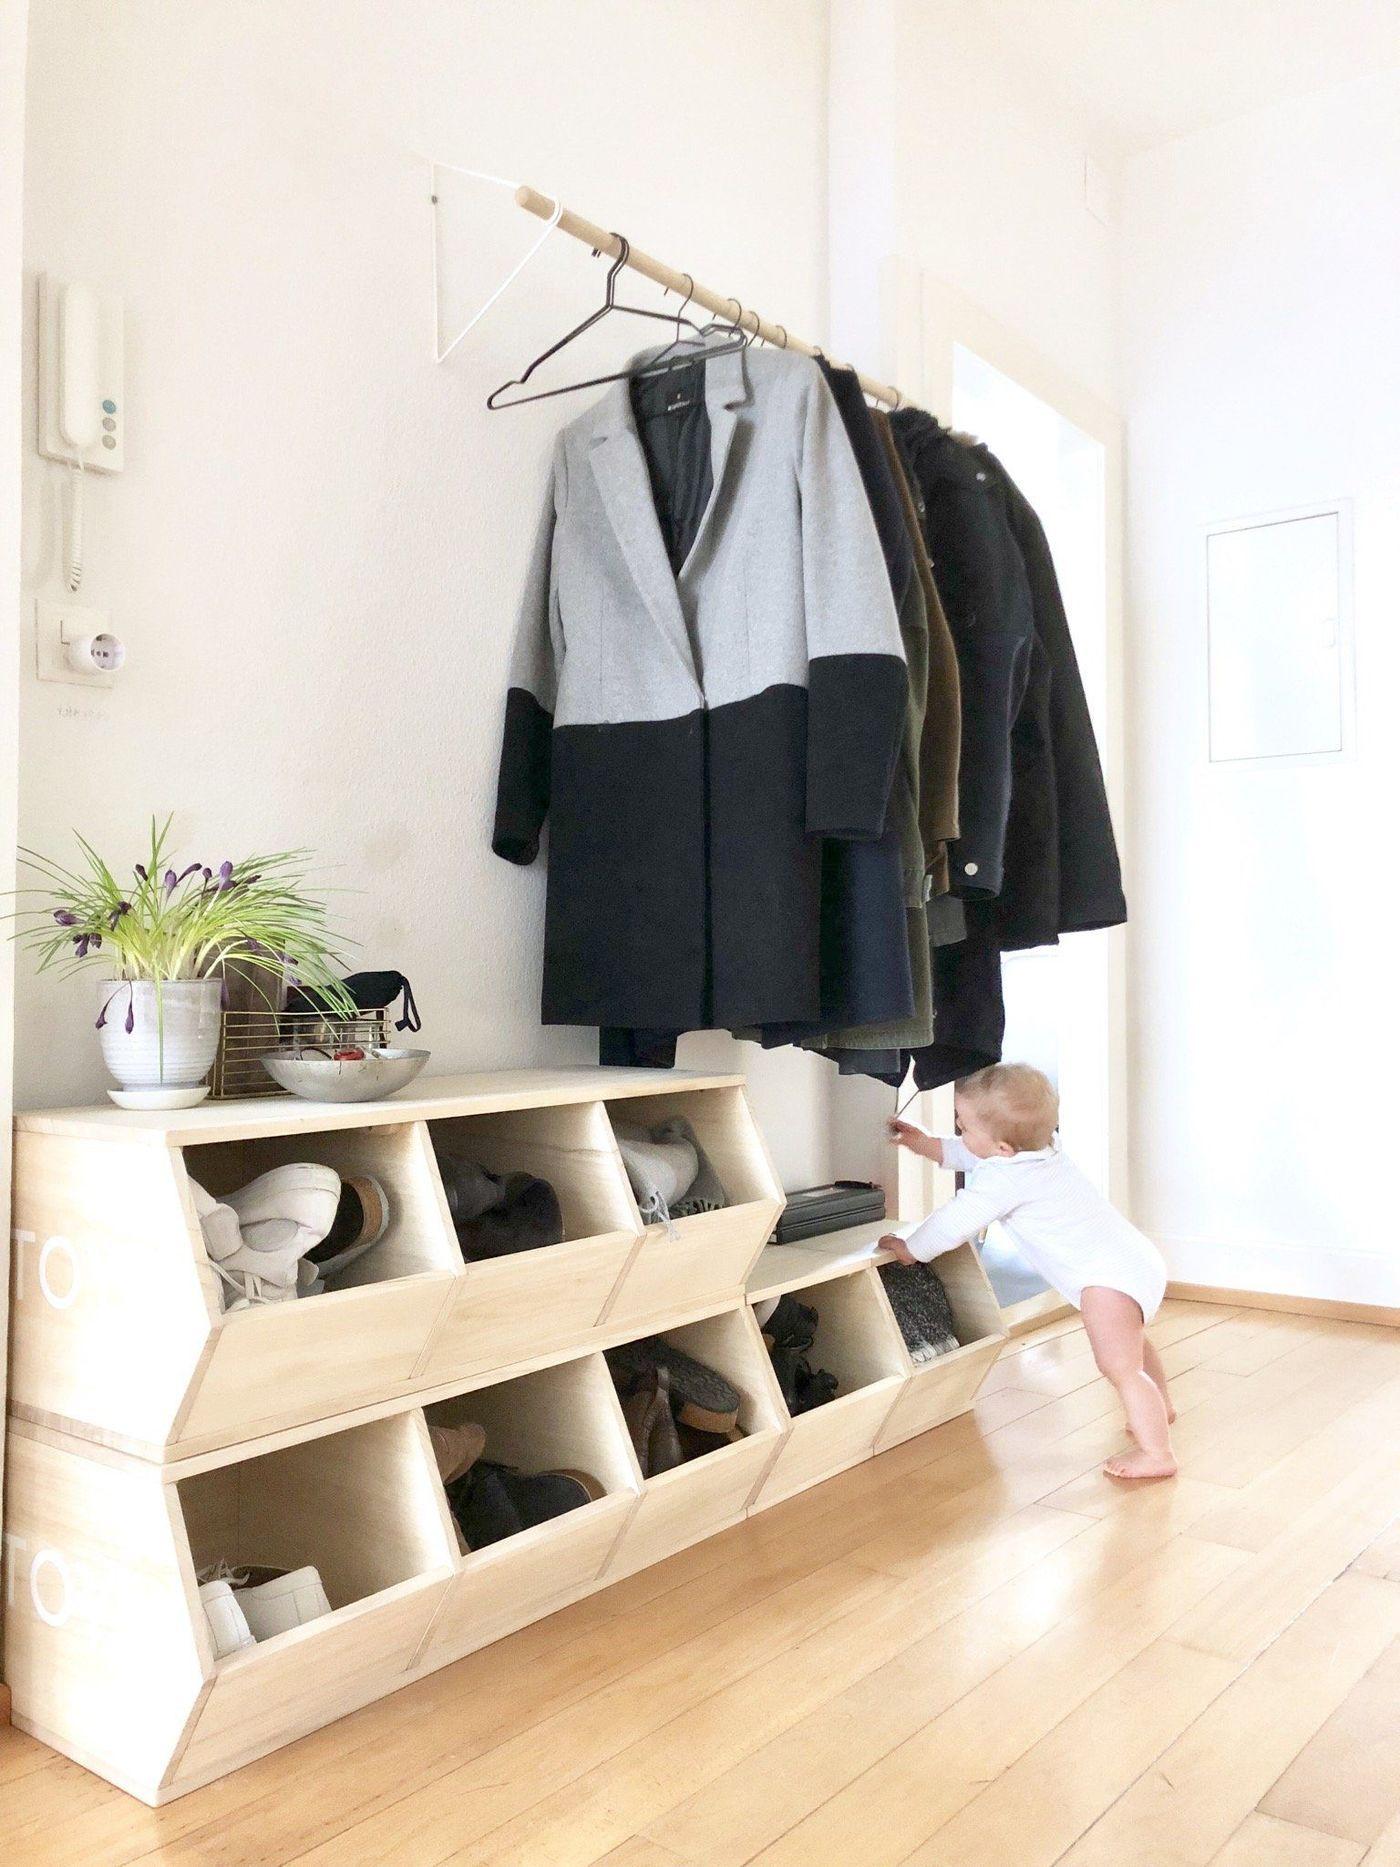 Hervorragend Garderobe Selber Bauen